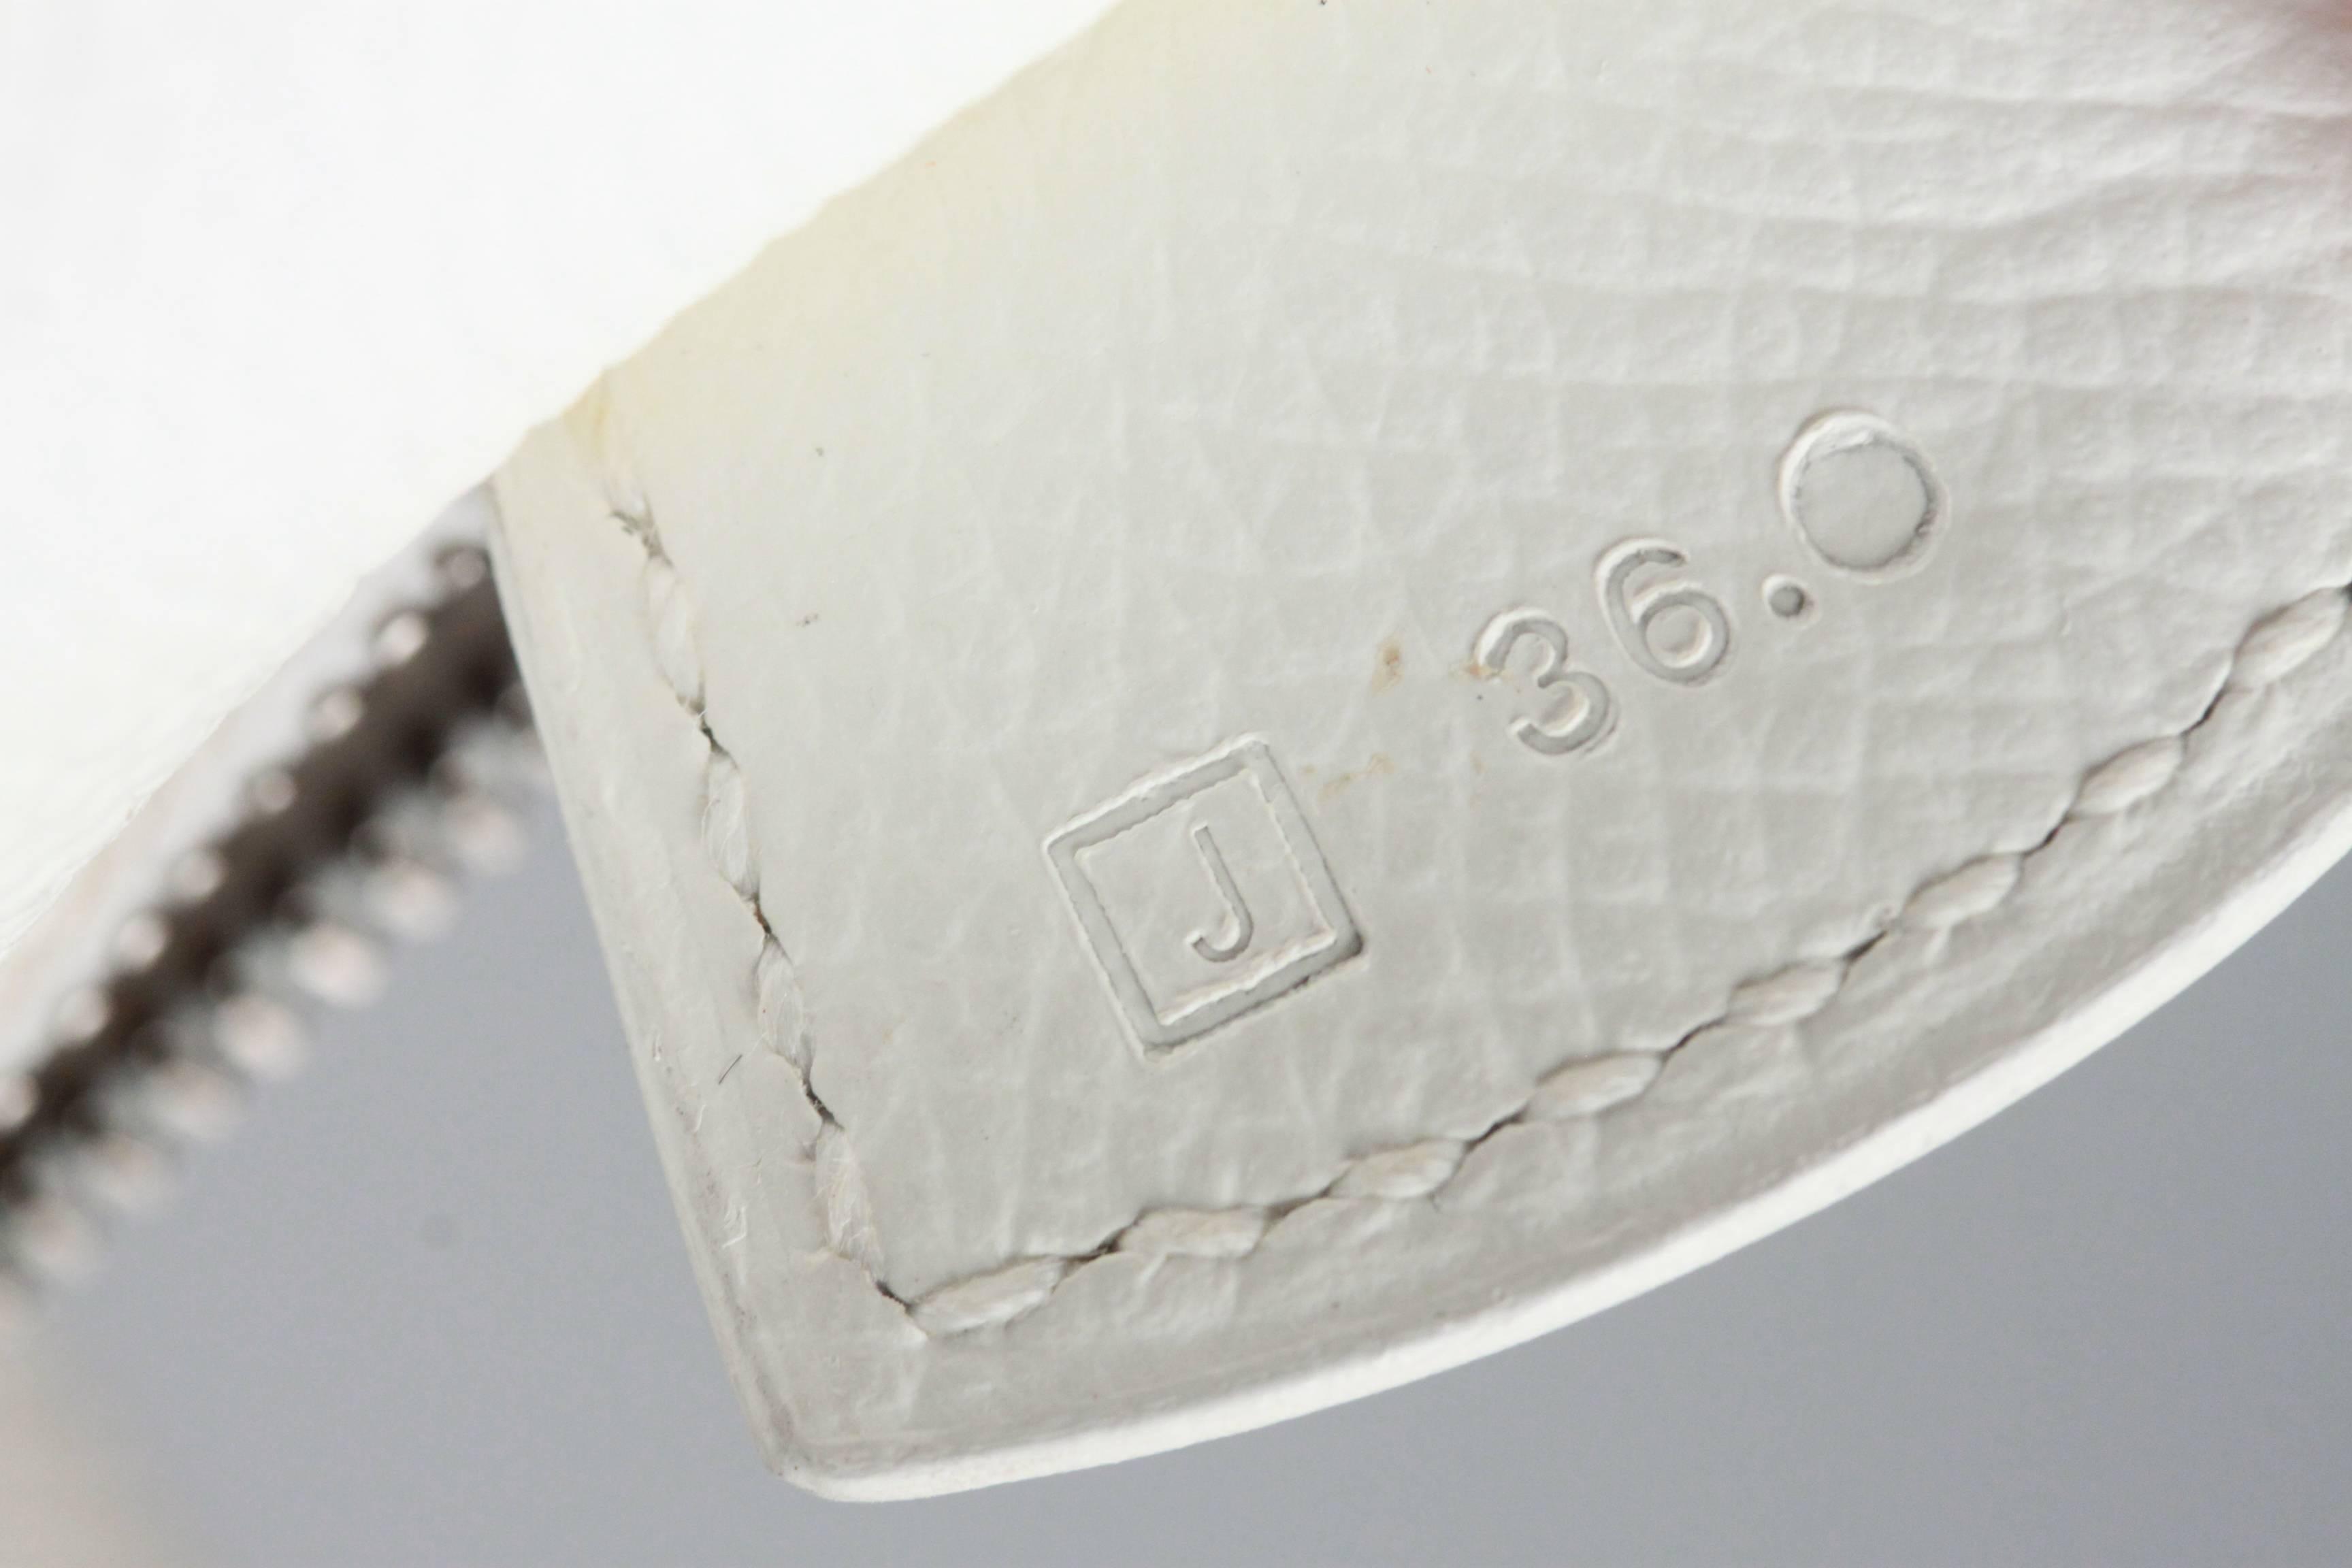 334ad5644bc3 ... sweden hermes paris white leather paris bombay bag 28 cm for sale at  1stdibs 78db3 72bcd